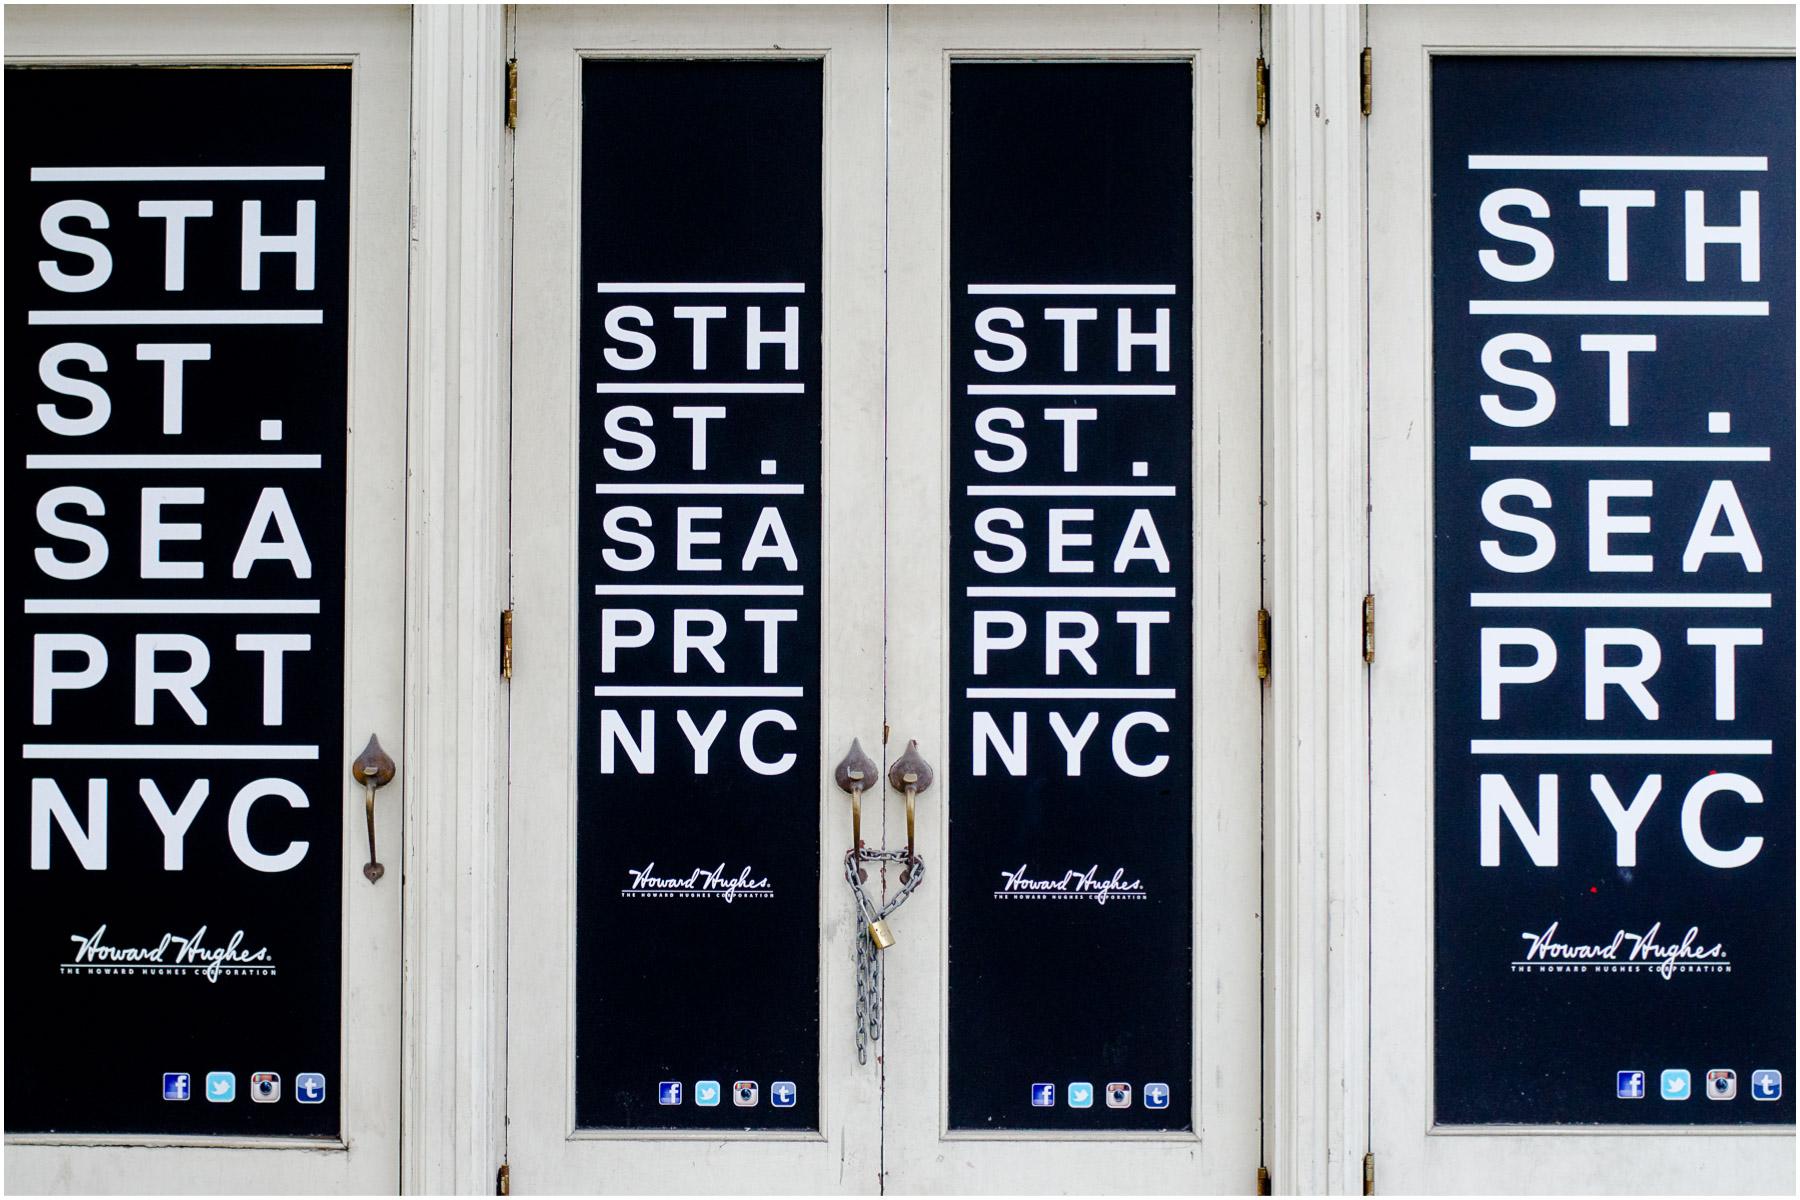 South-Street-Seaport-NYC-FIDI_1.jpg